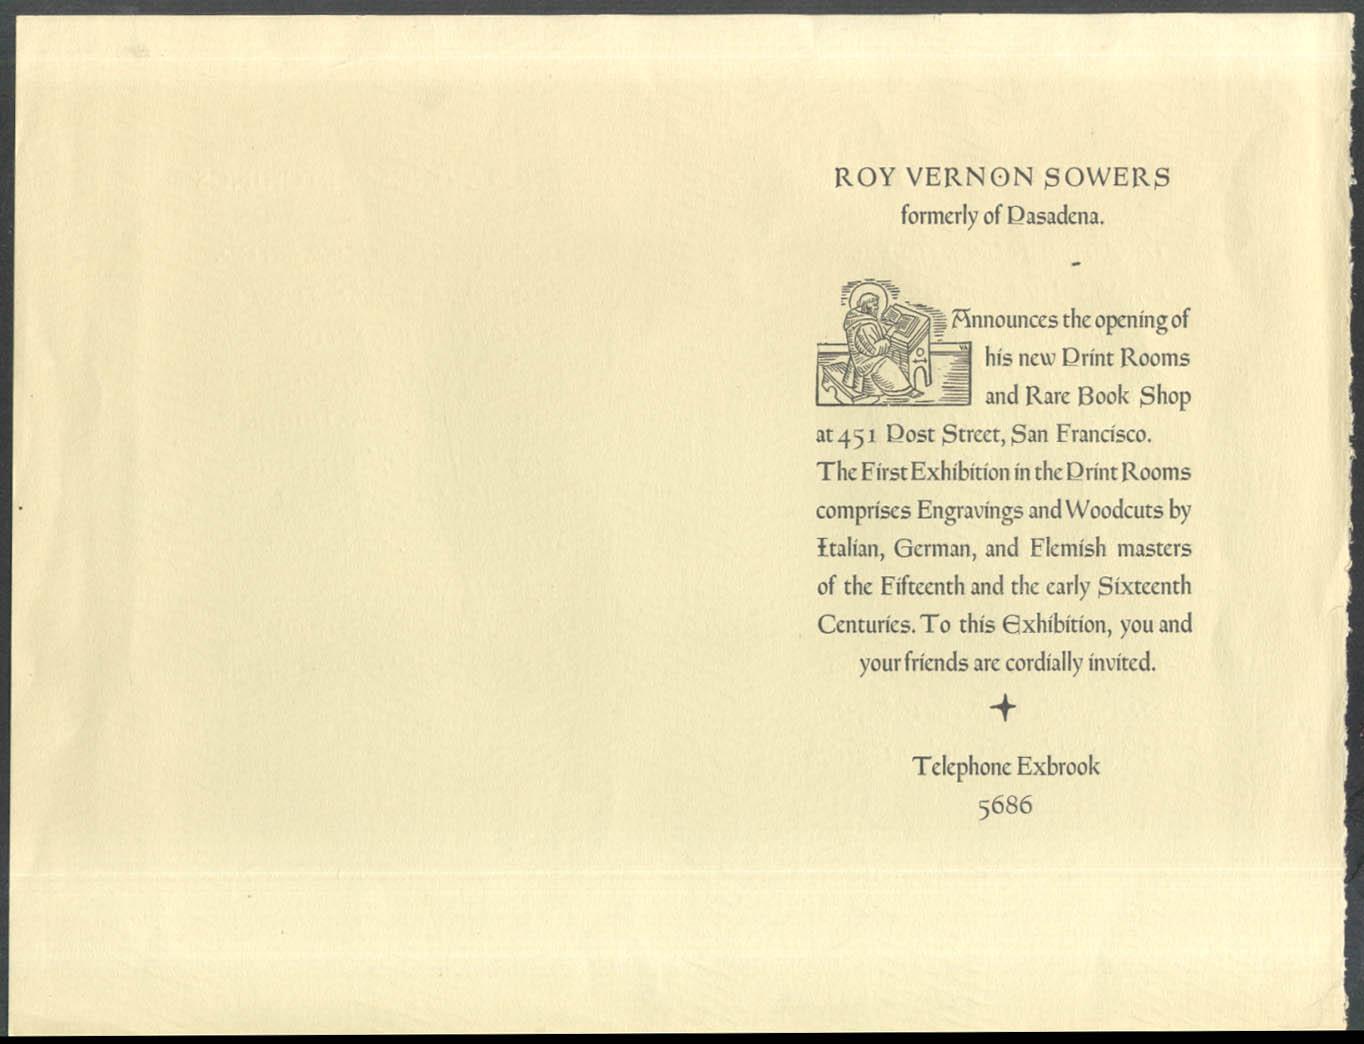 Roy Vernon Sowers Print Room Exhibition Announcement Grabhorn ca 1930s